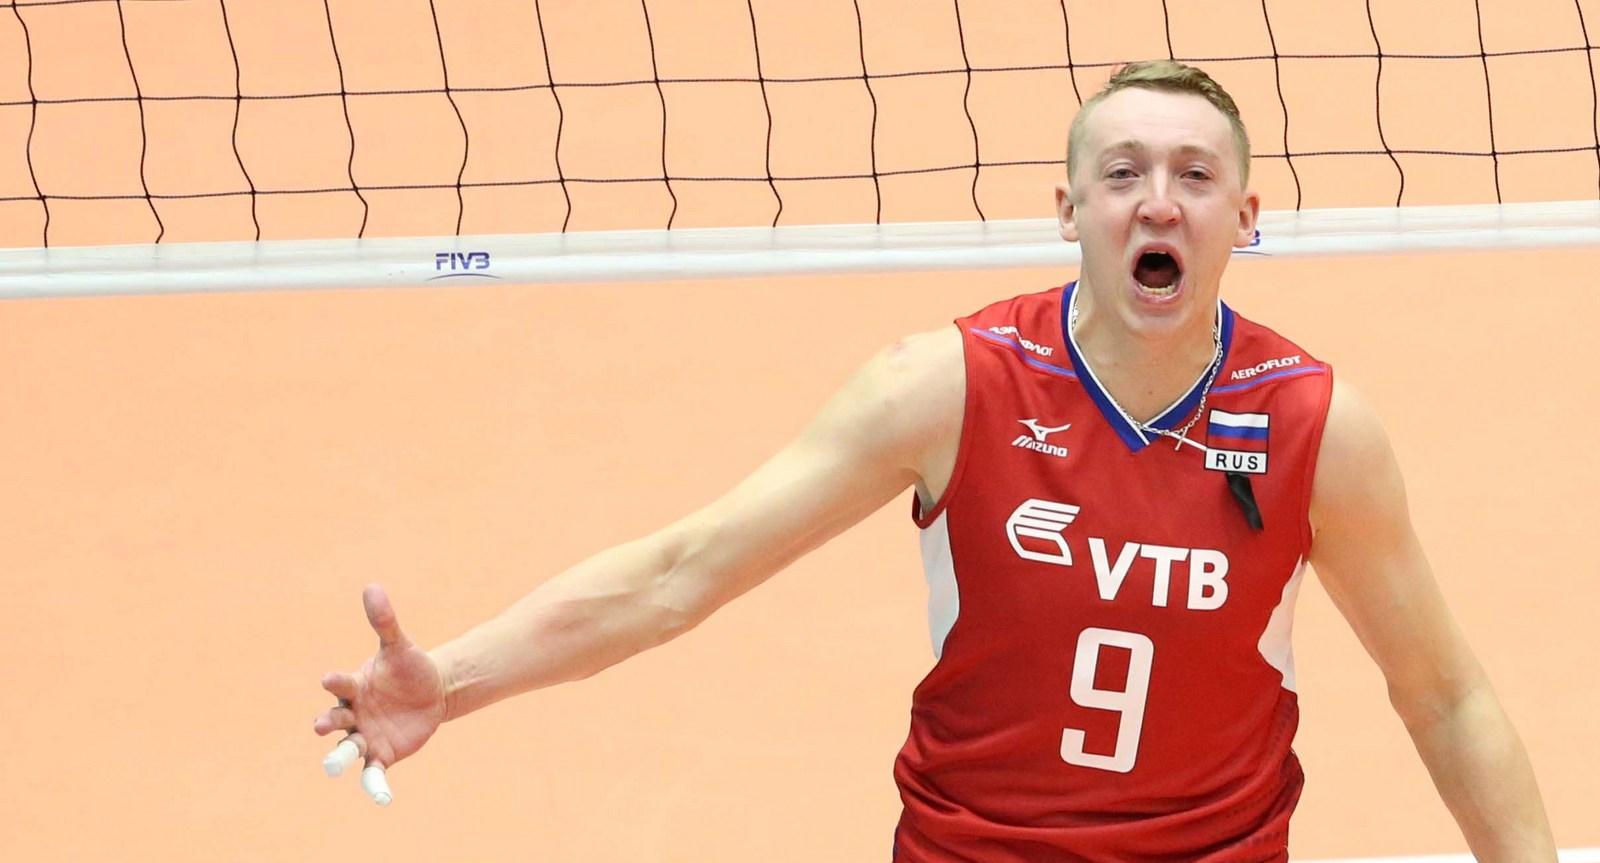 http://www.volleywood.net/wp-content/uploads/2013/11/alexey-spiridonov-russian-volleyball-player.jpg